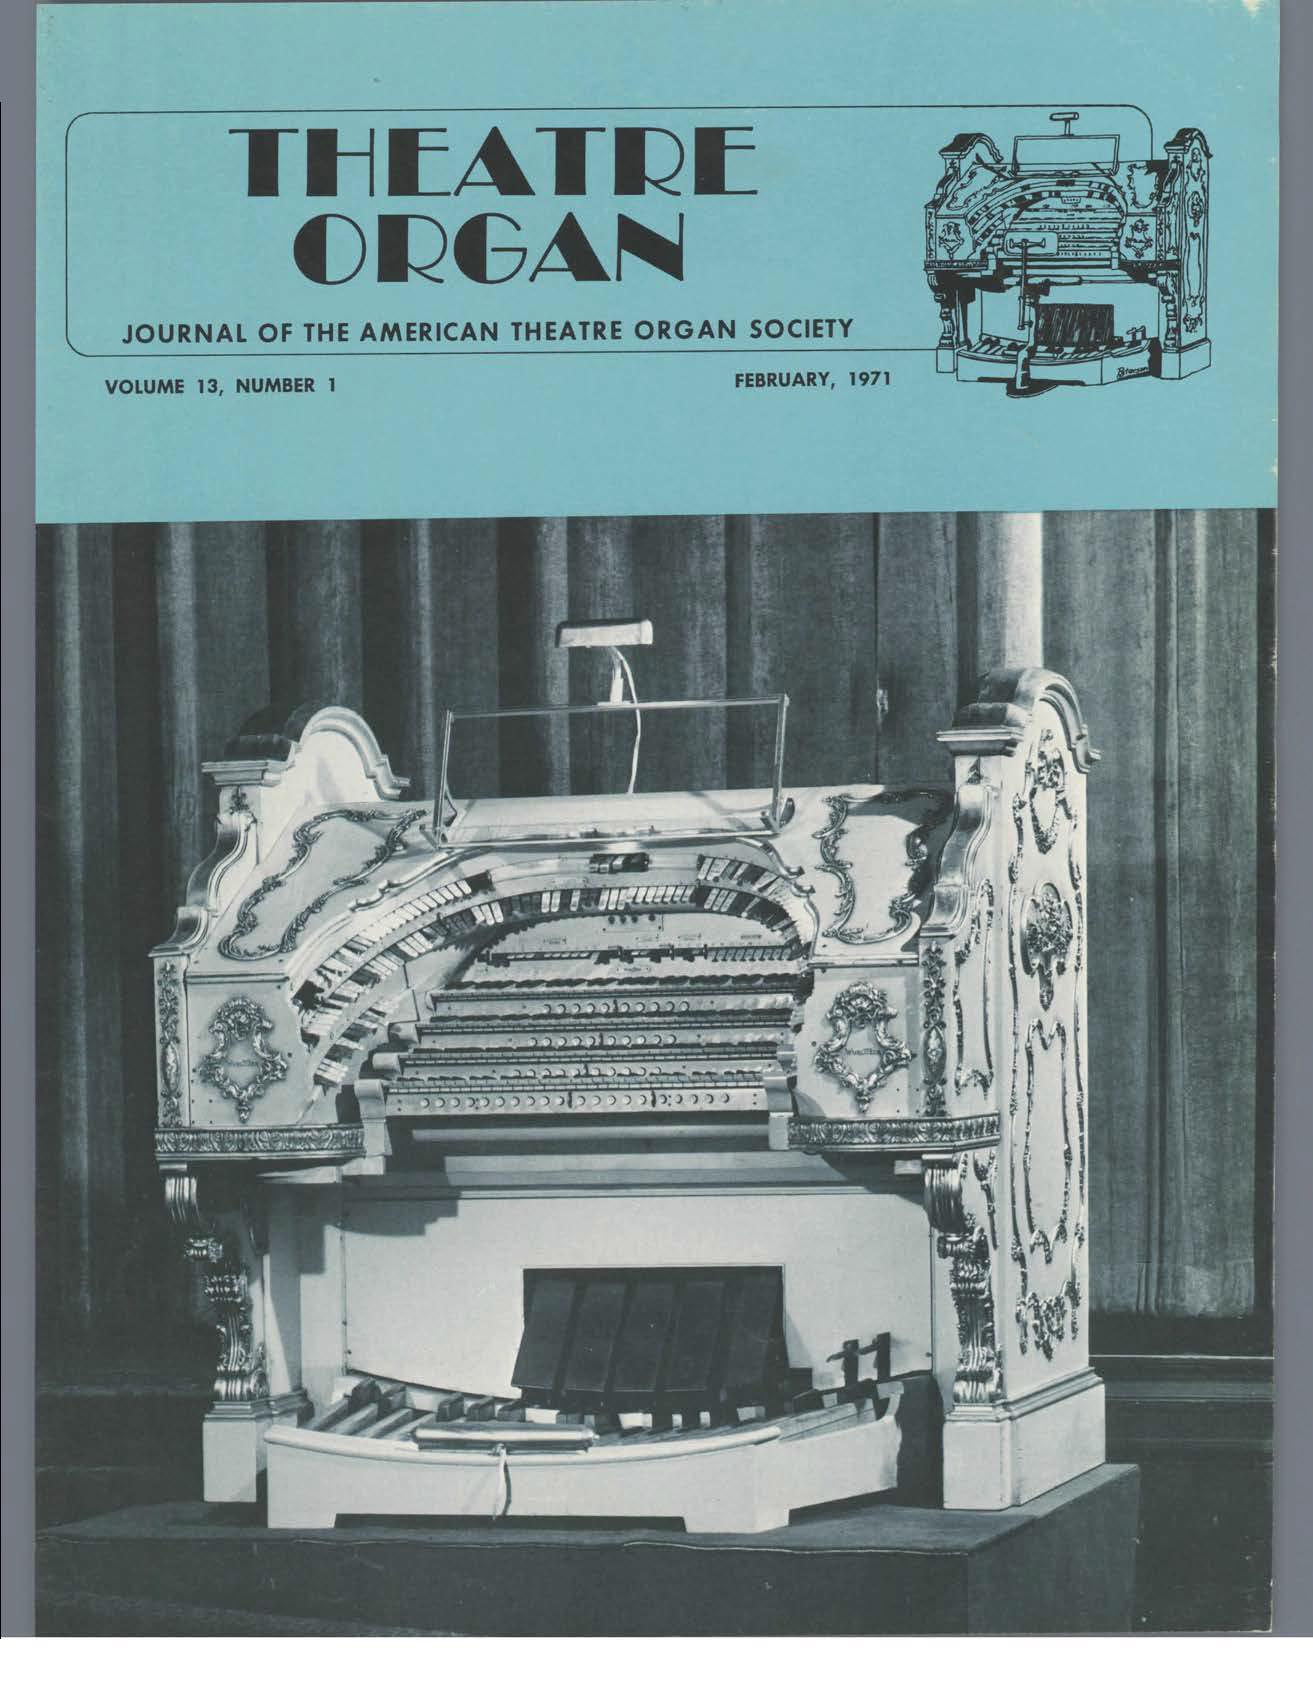 Theatre Organ, February 1971, Volume 13, Number 1